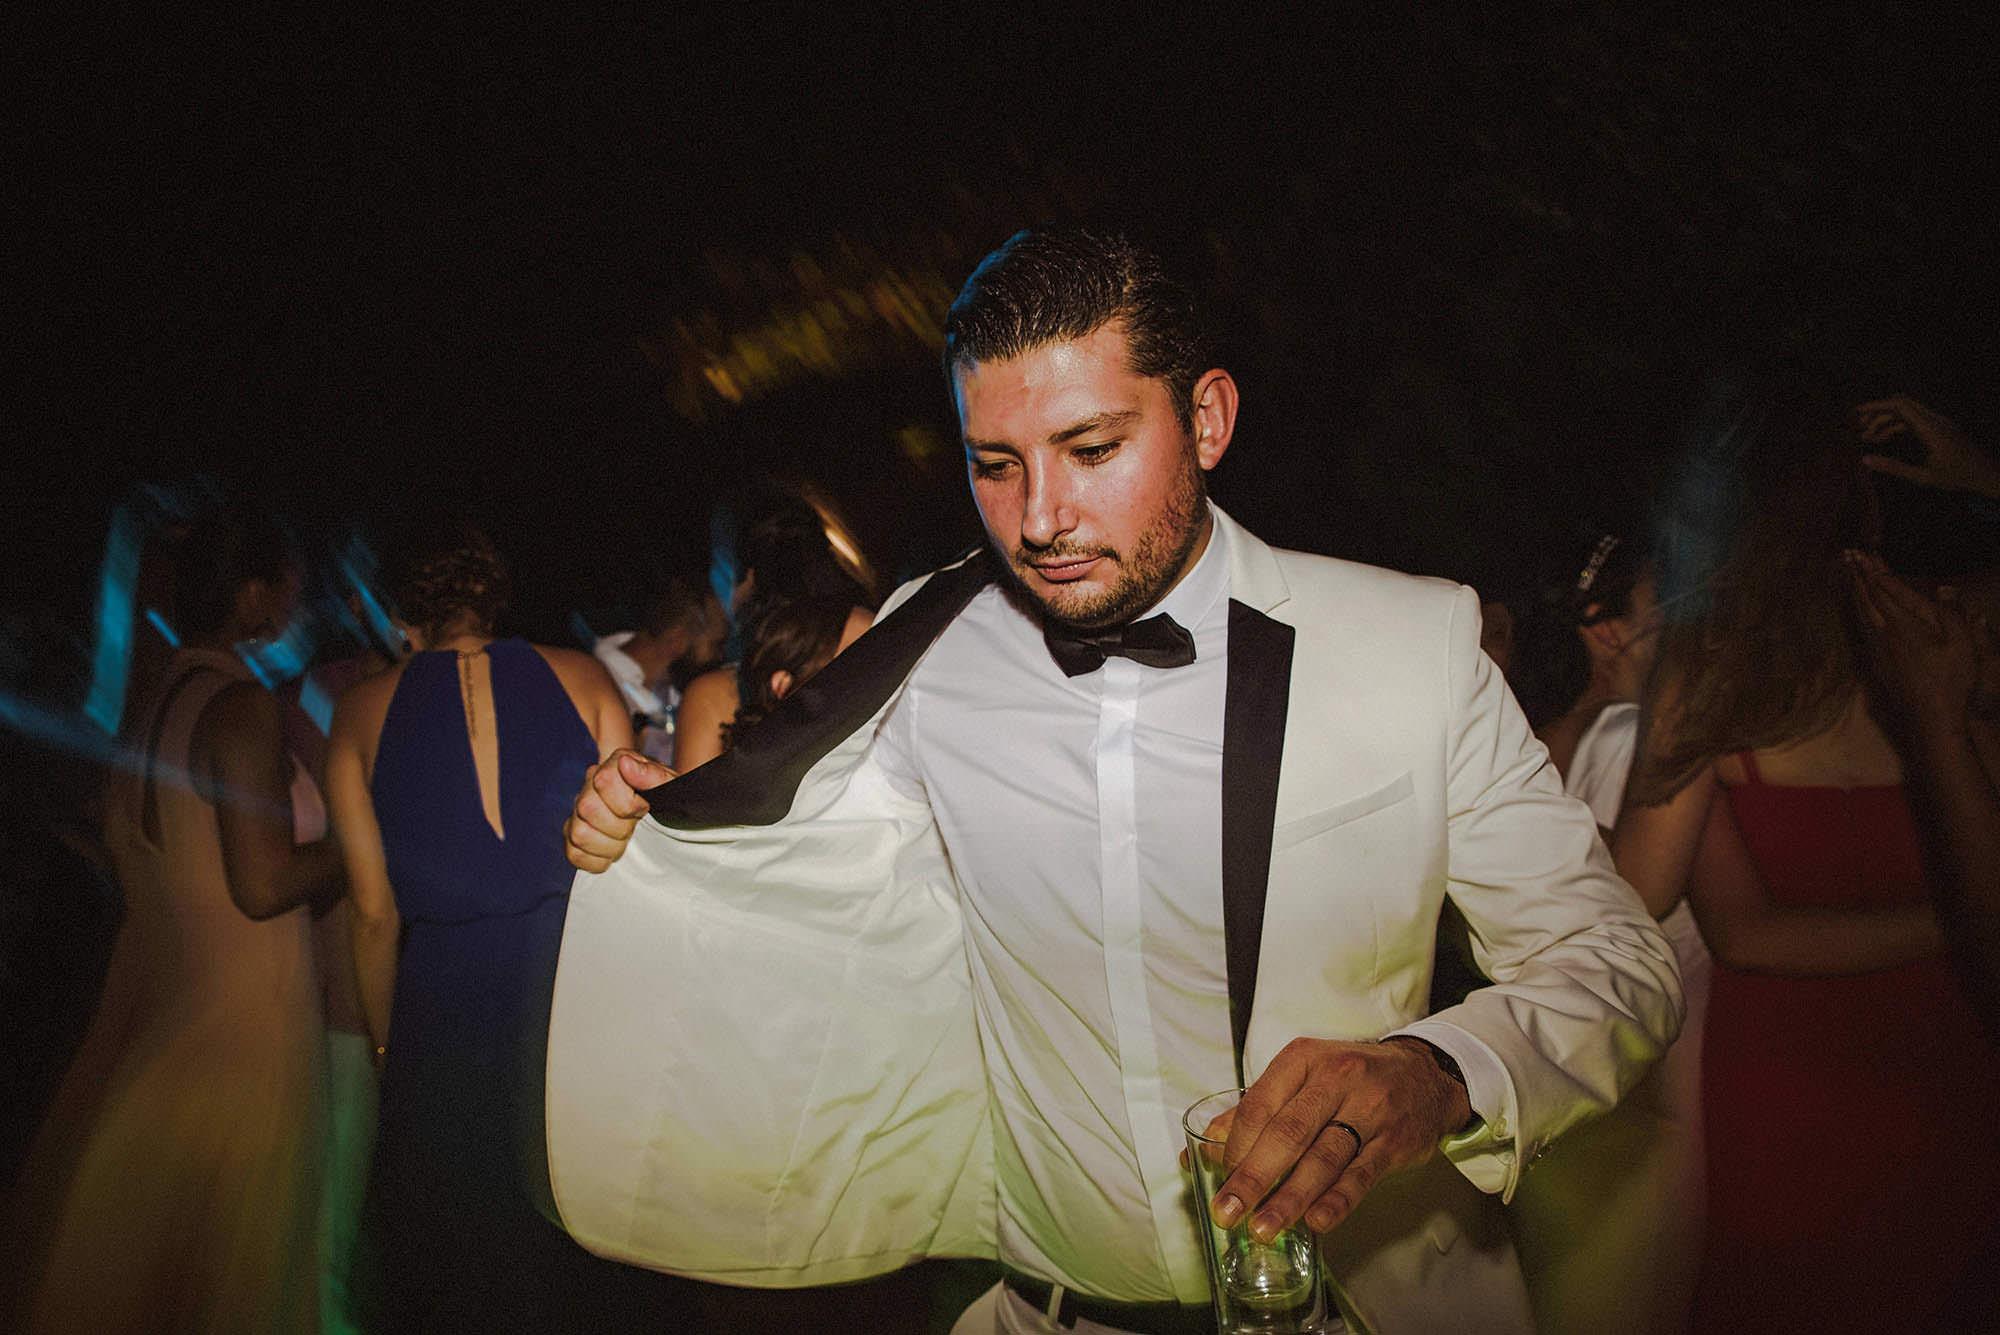 Wedding playa del carmen planner destination mexico magali espinosa45-WEB.jpg